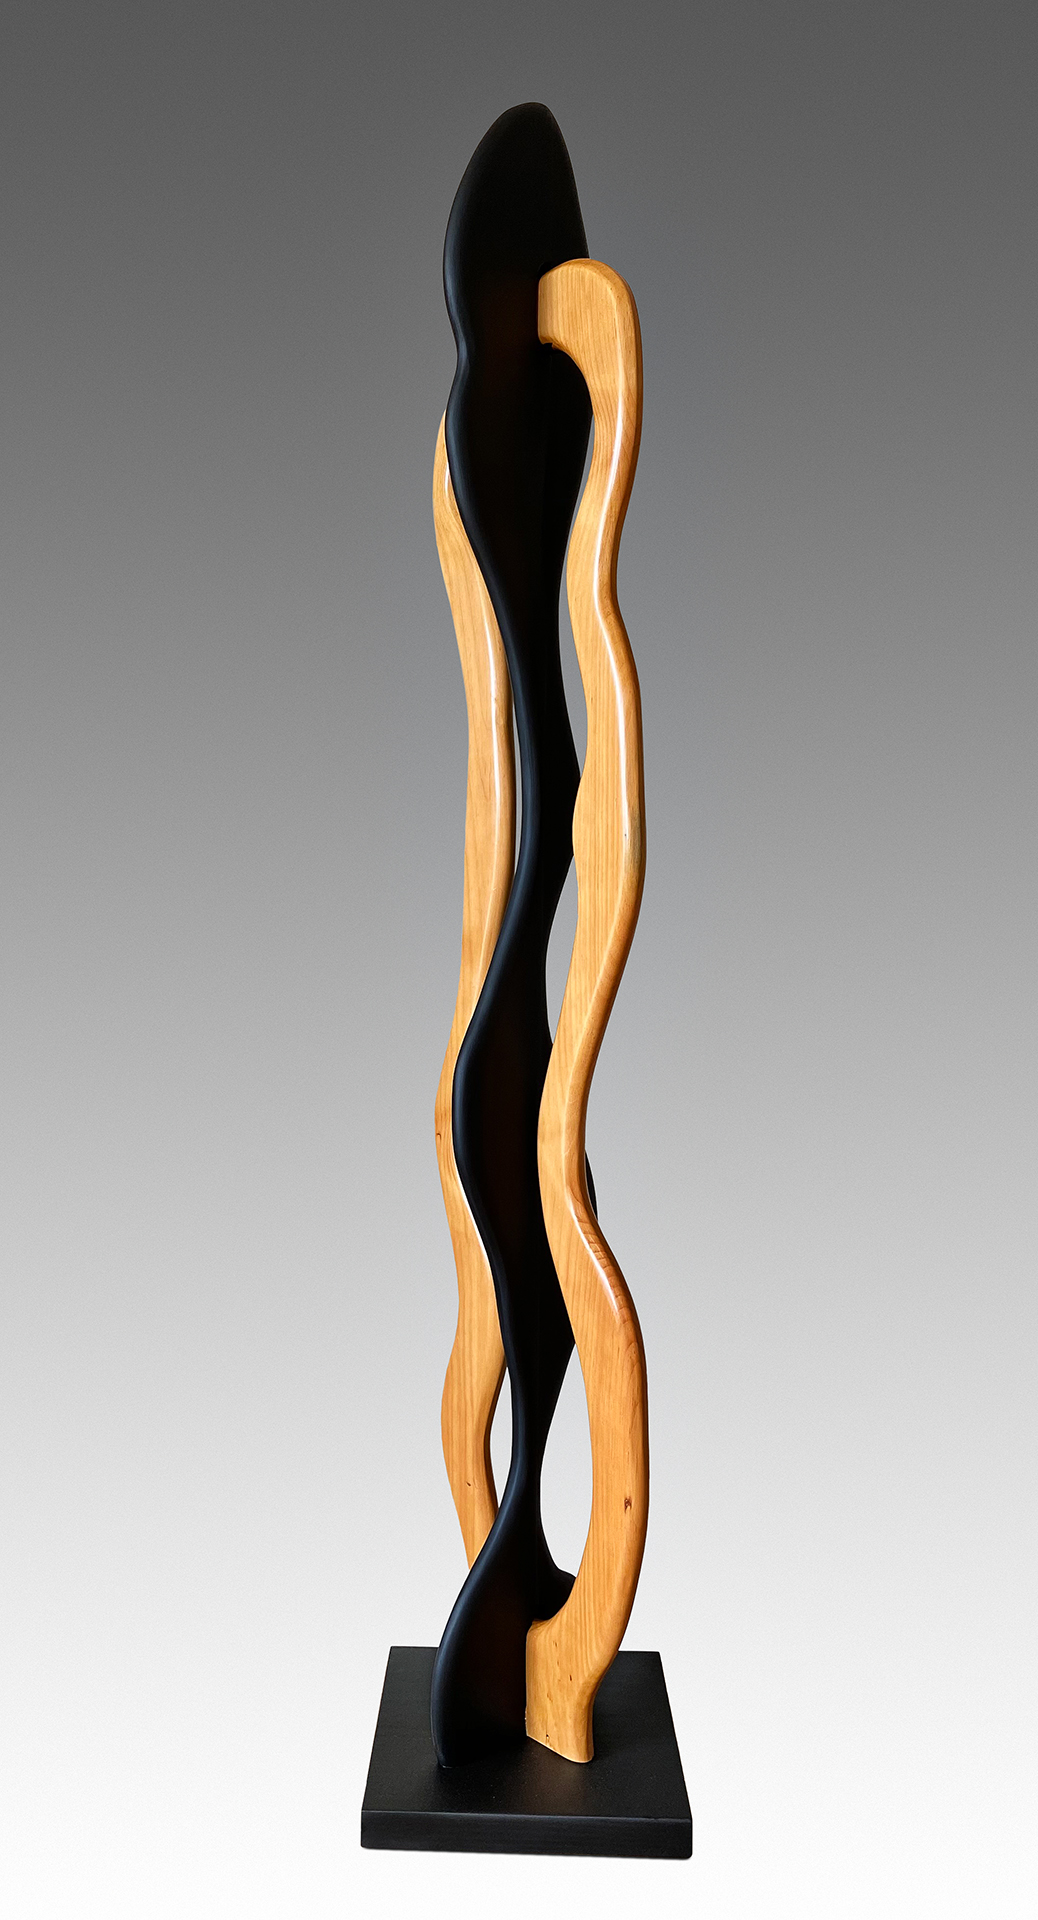 Curves-sculpture copyright Scott Bruckner